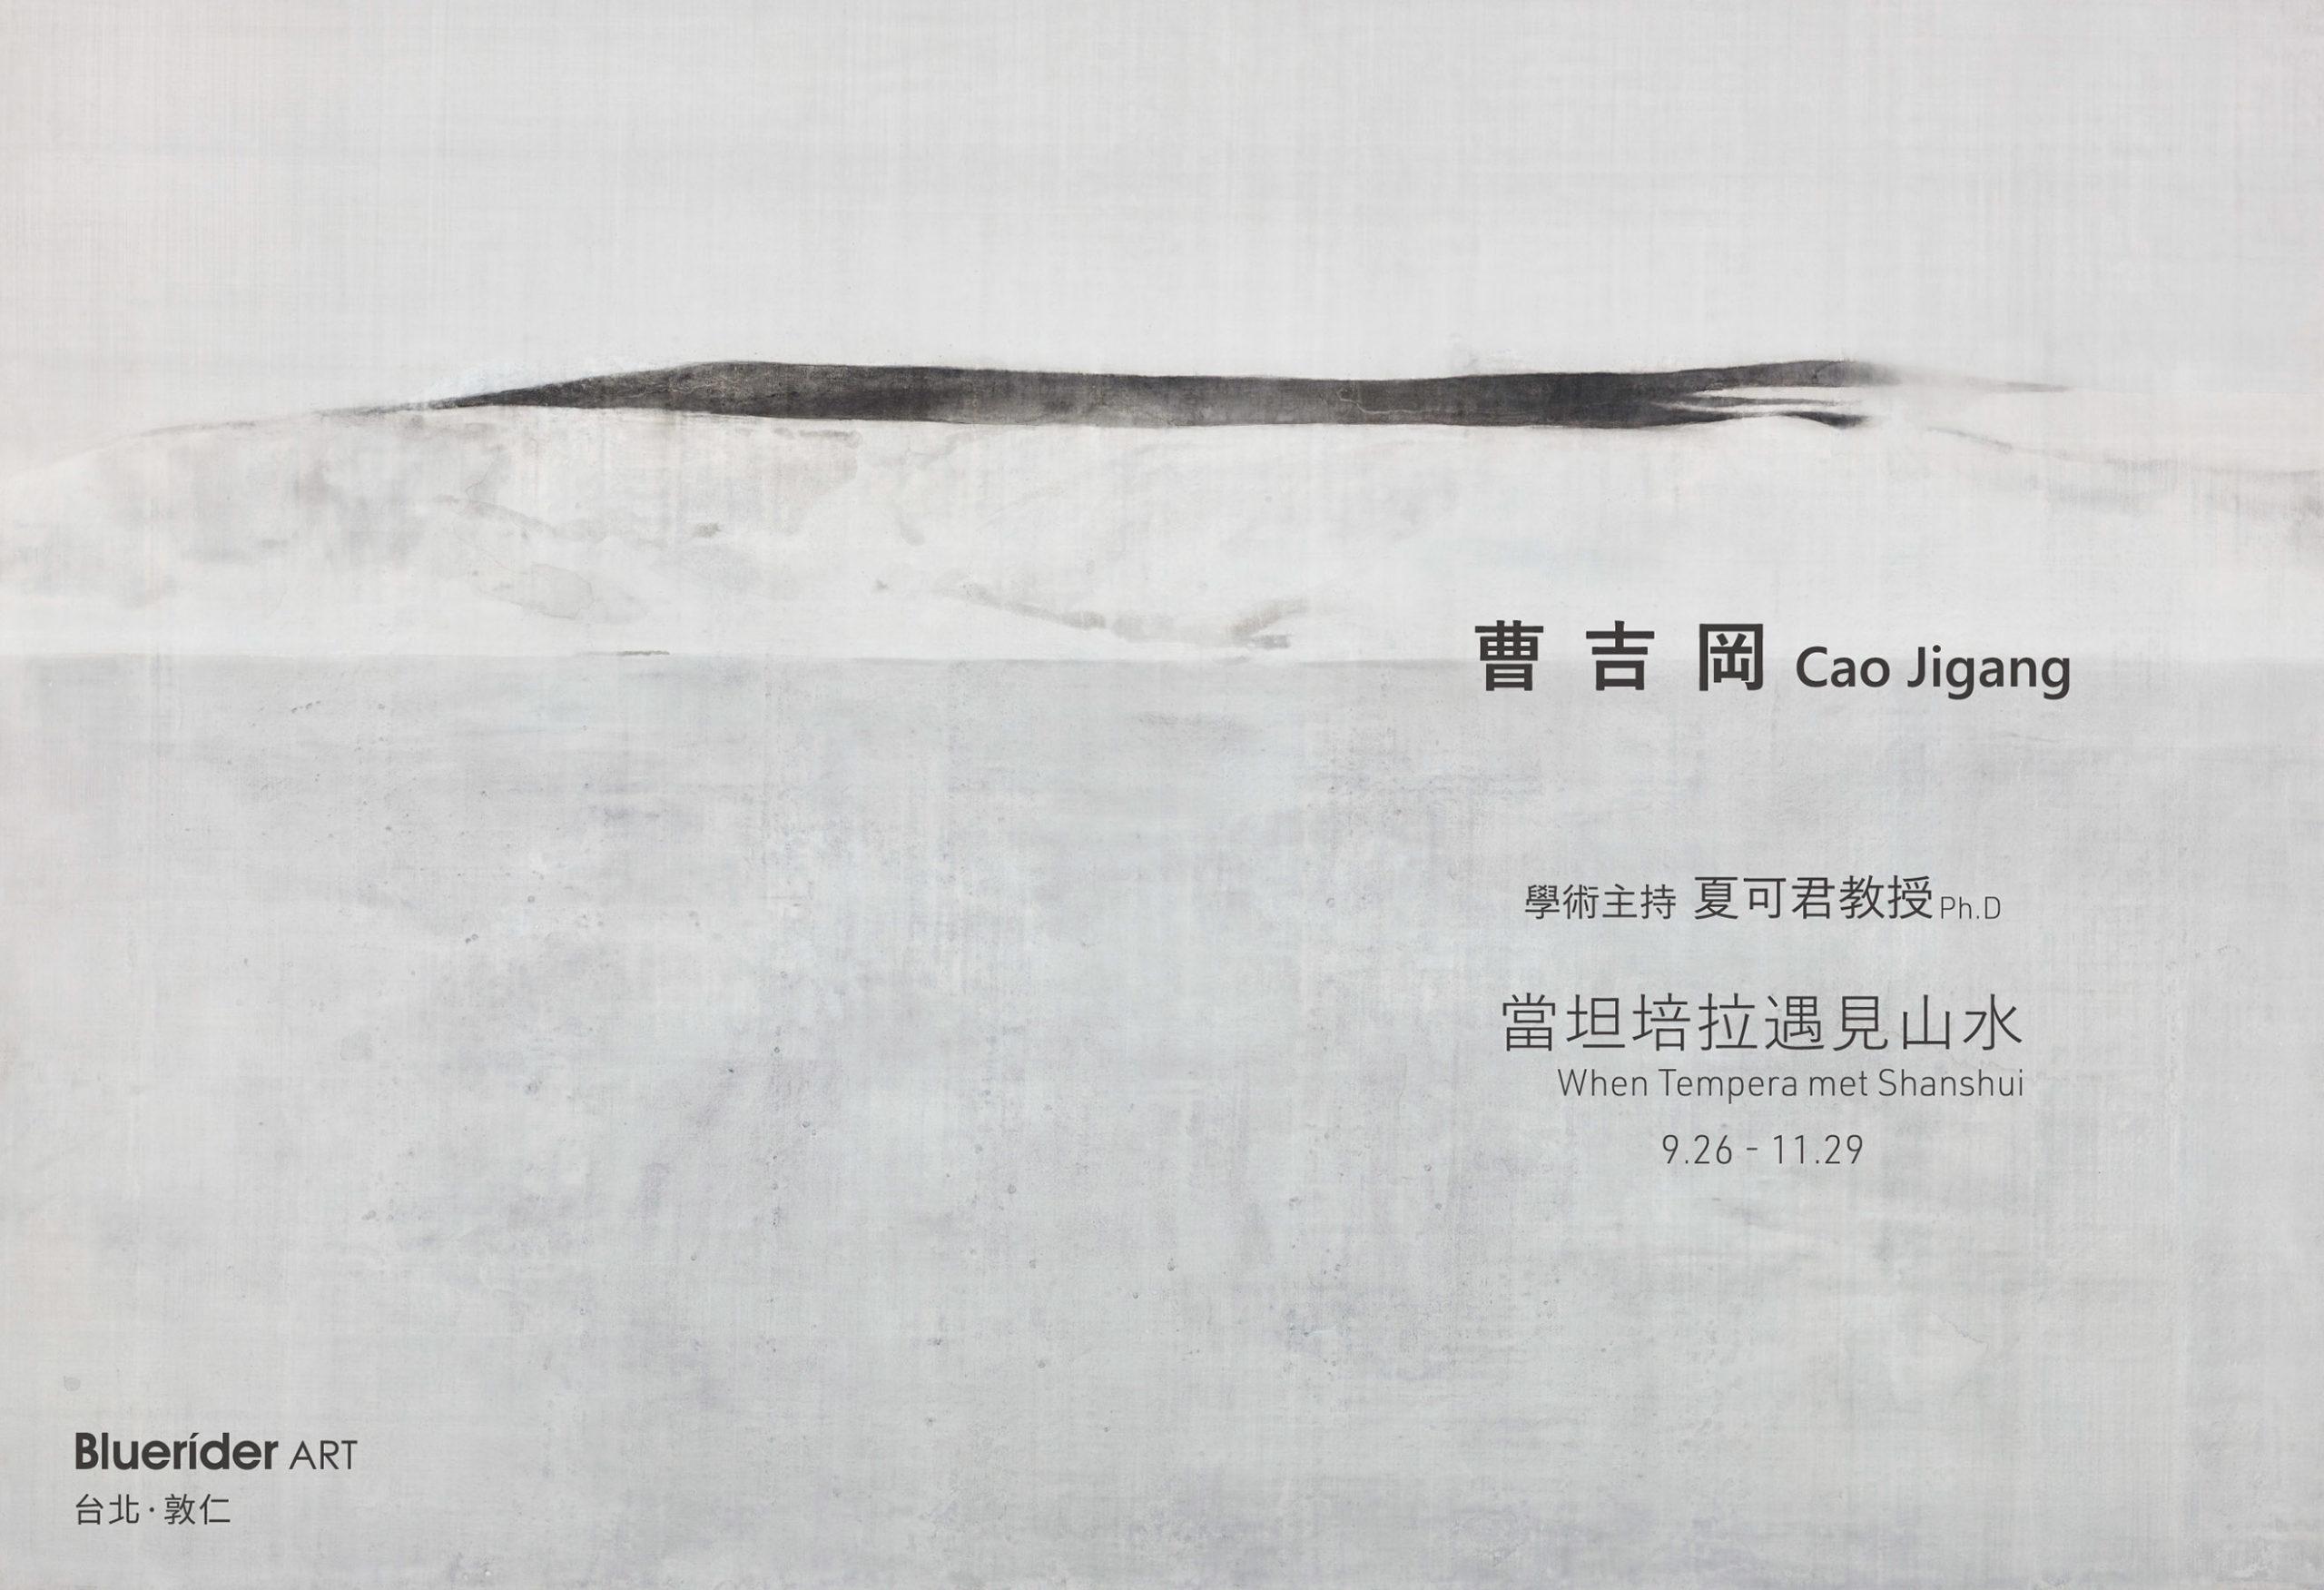 【台北·敦仁】當坦培拉遇見山水 When Tempera met Shanshui – 曹吉岡 Cao Jigang 首個展 9.26-12.13,2020